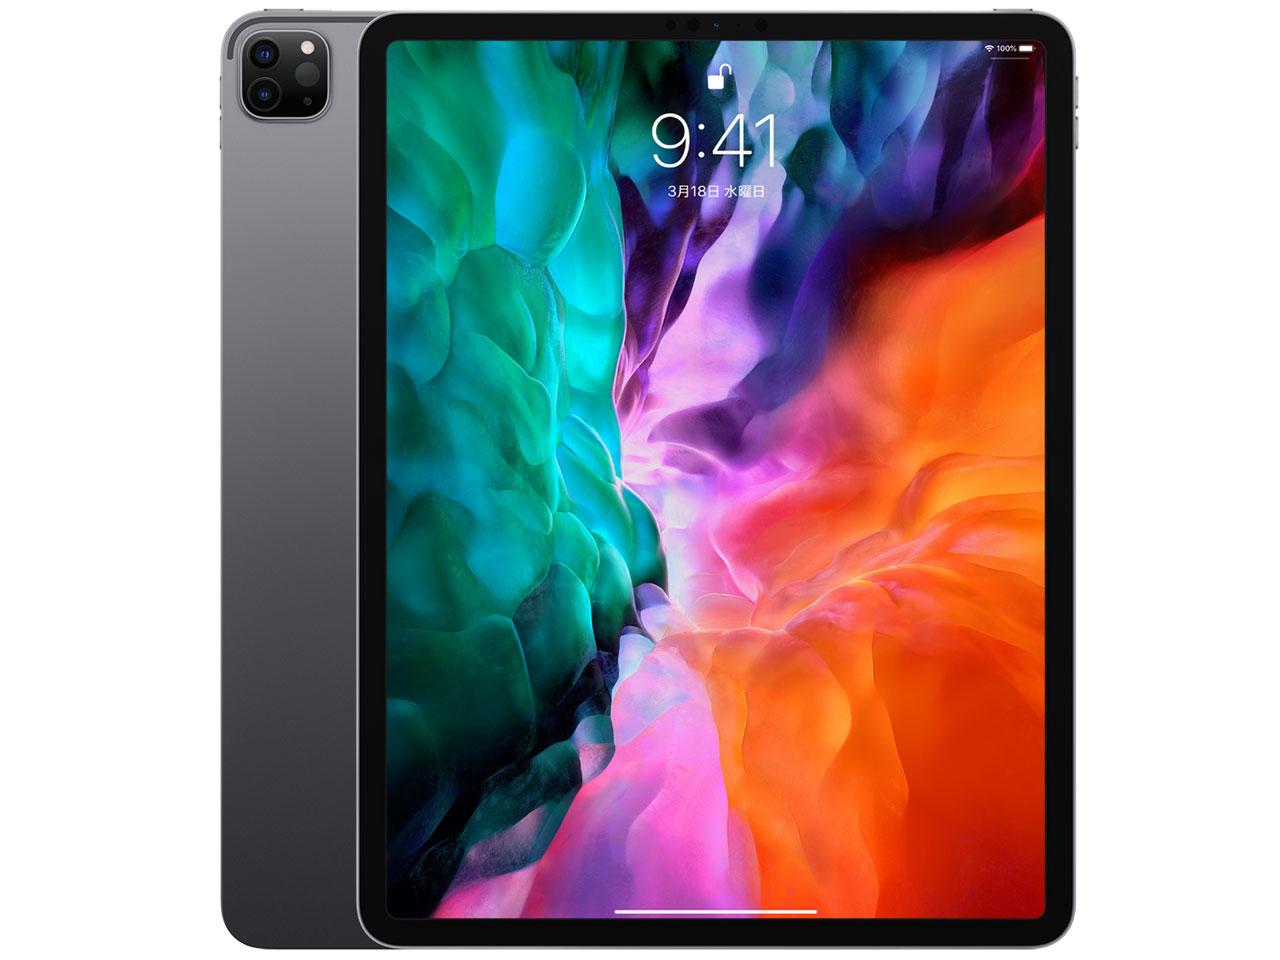 iPad Pro 12.9インチ 第4世代 Wi-Fi 256GB 2020年春モデル MXAT2J/A [スペースグレイ]【新品 保証未開始 未開封品】